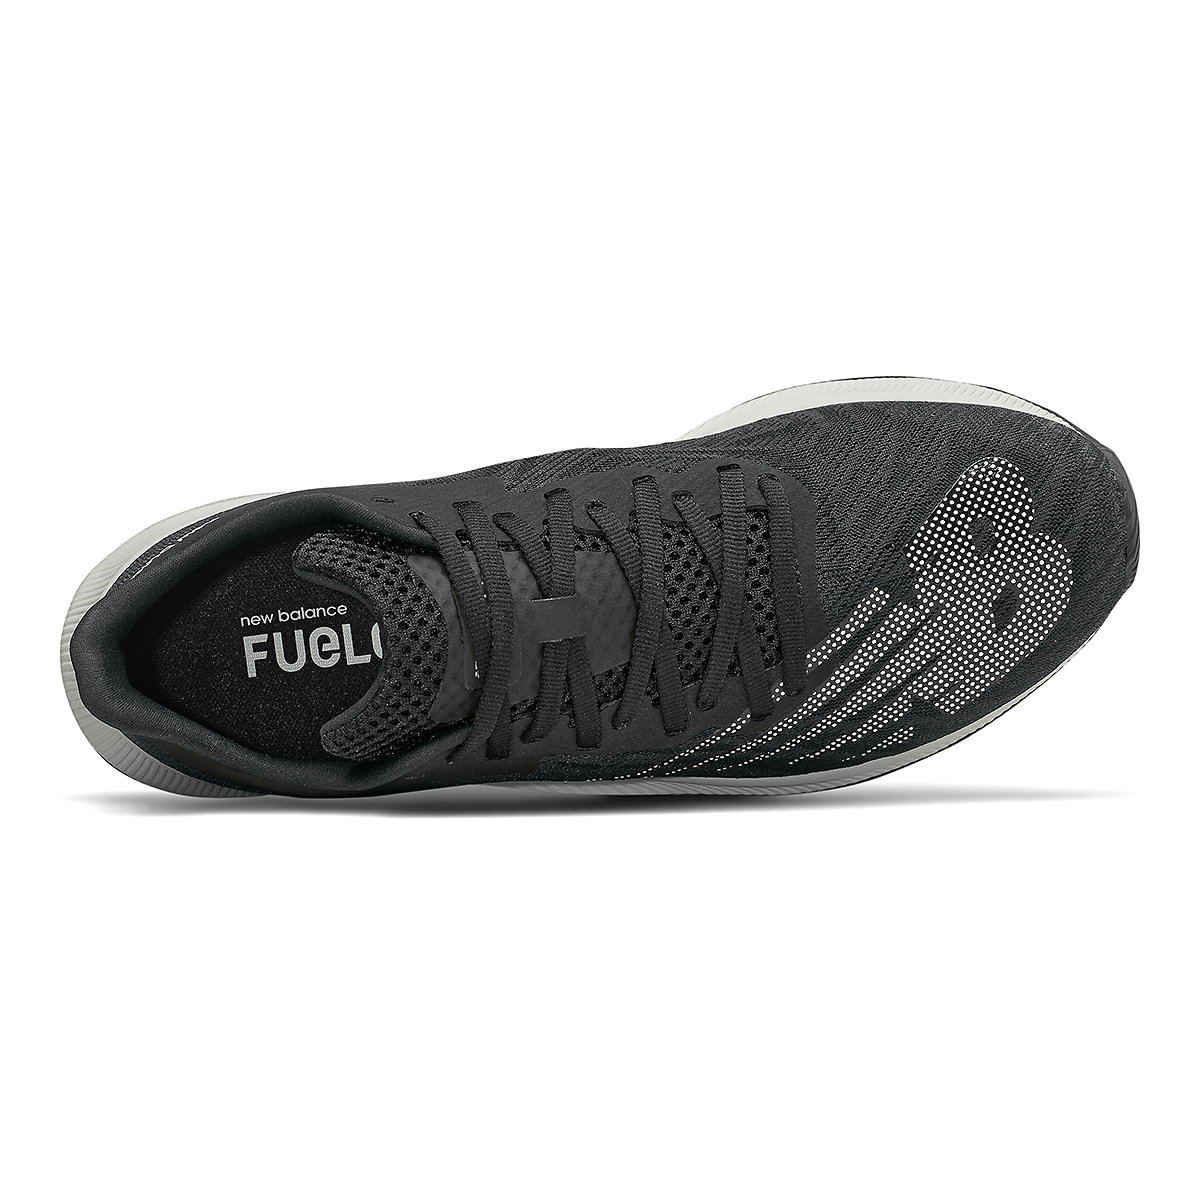 Men's New Balance Fuelcell Prism Running Shoe - Color: Black - Size: 7 - Width: Wide, Black, large, image 3